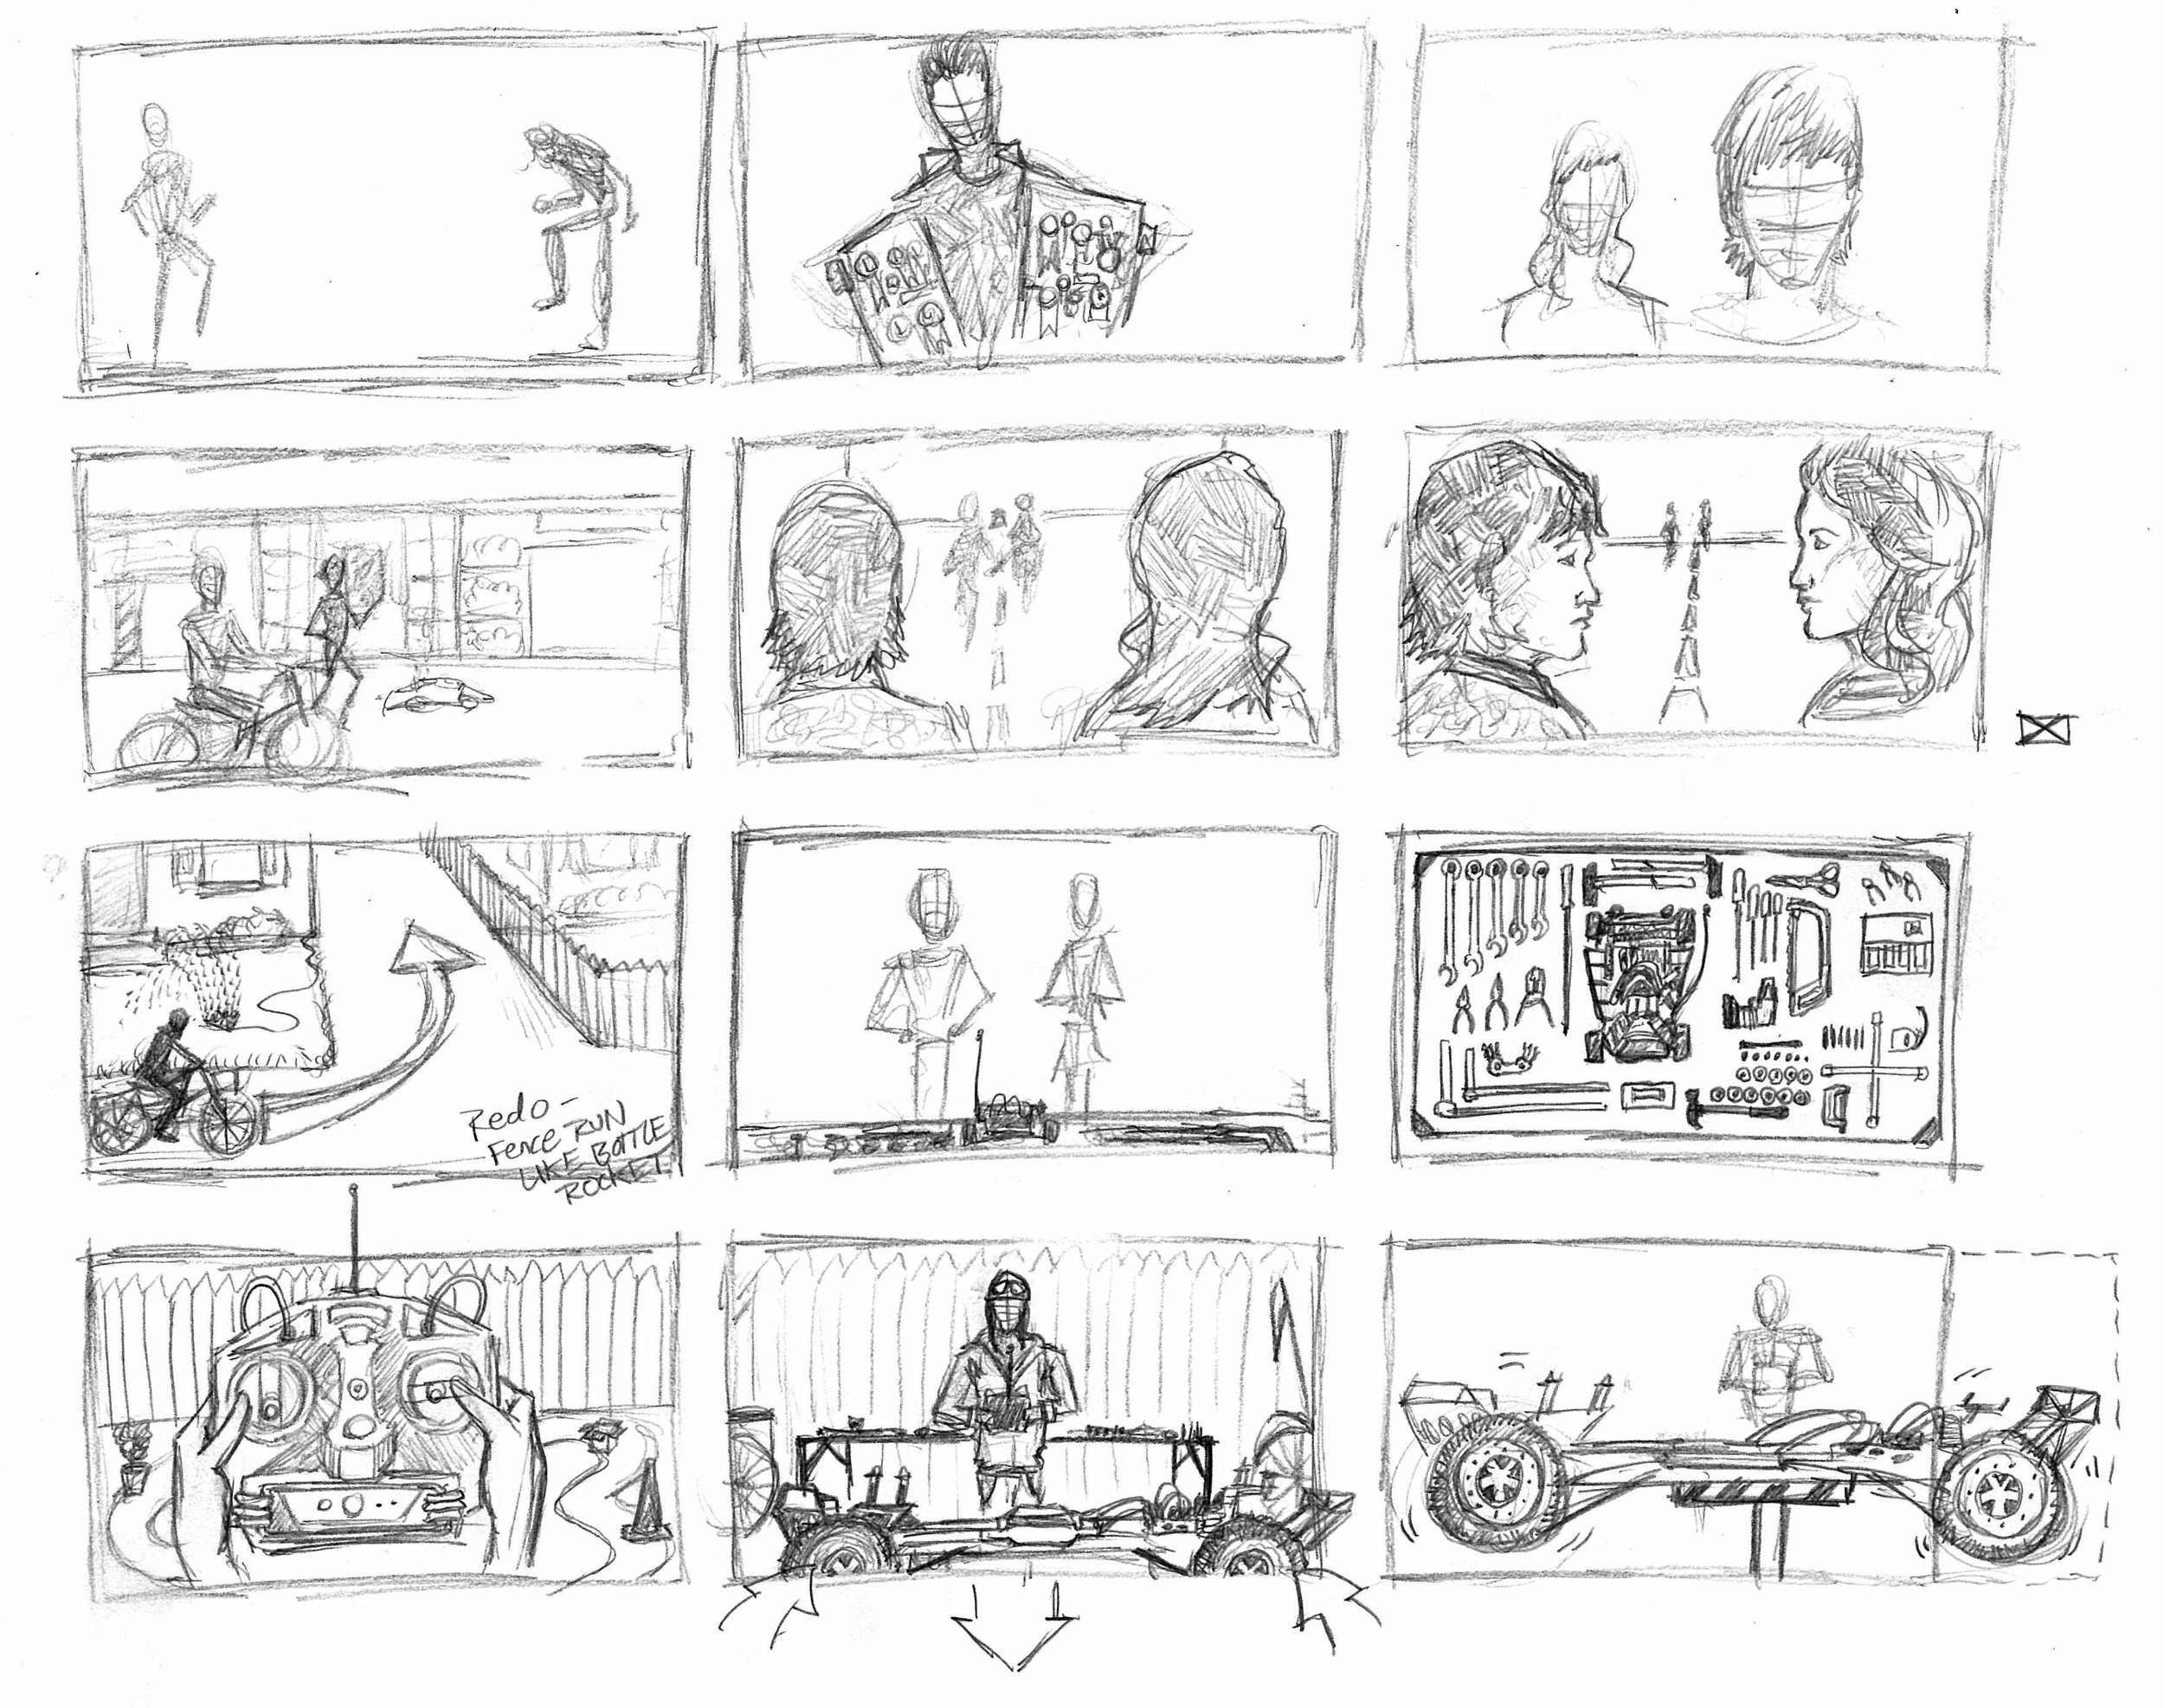 Prix Storyboard_PG002 - Film and TV - Jonathan B Perez - cREAtive Castle Studios.jpg